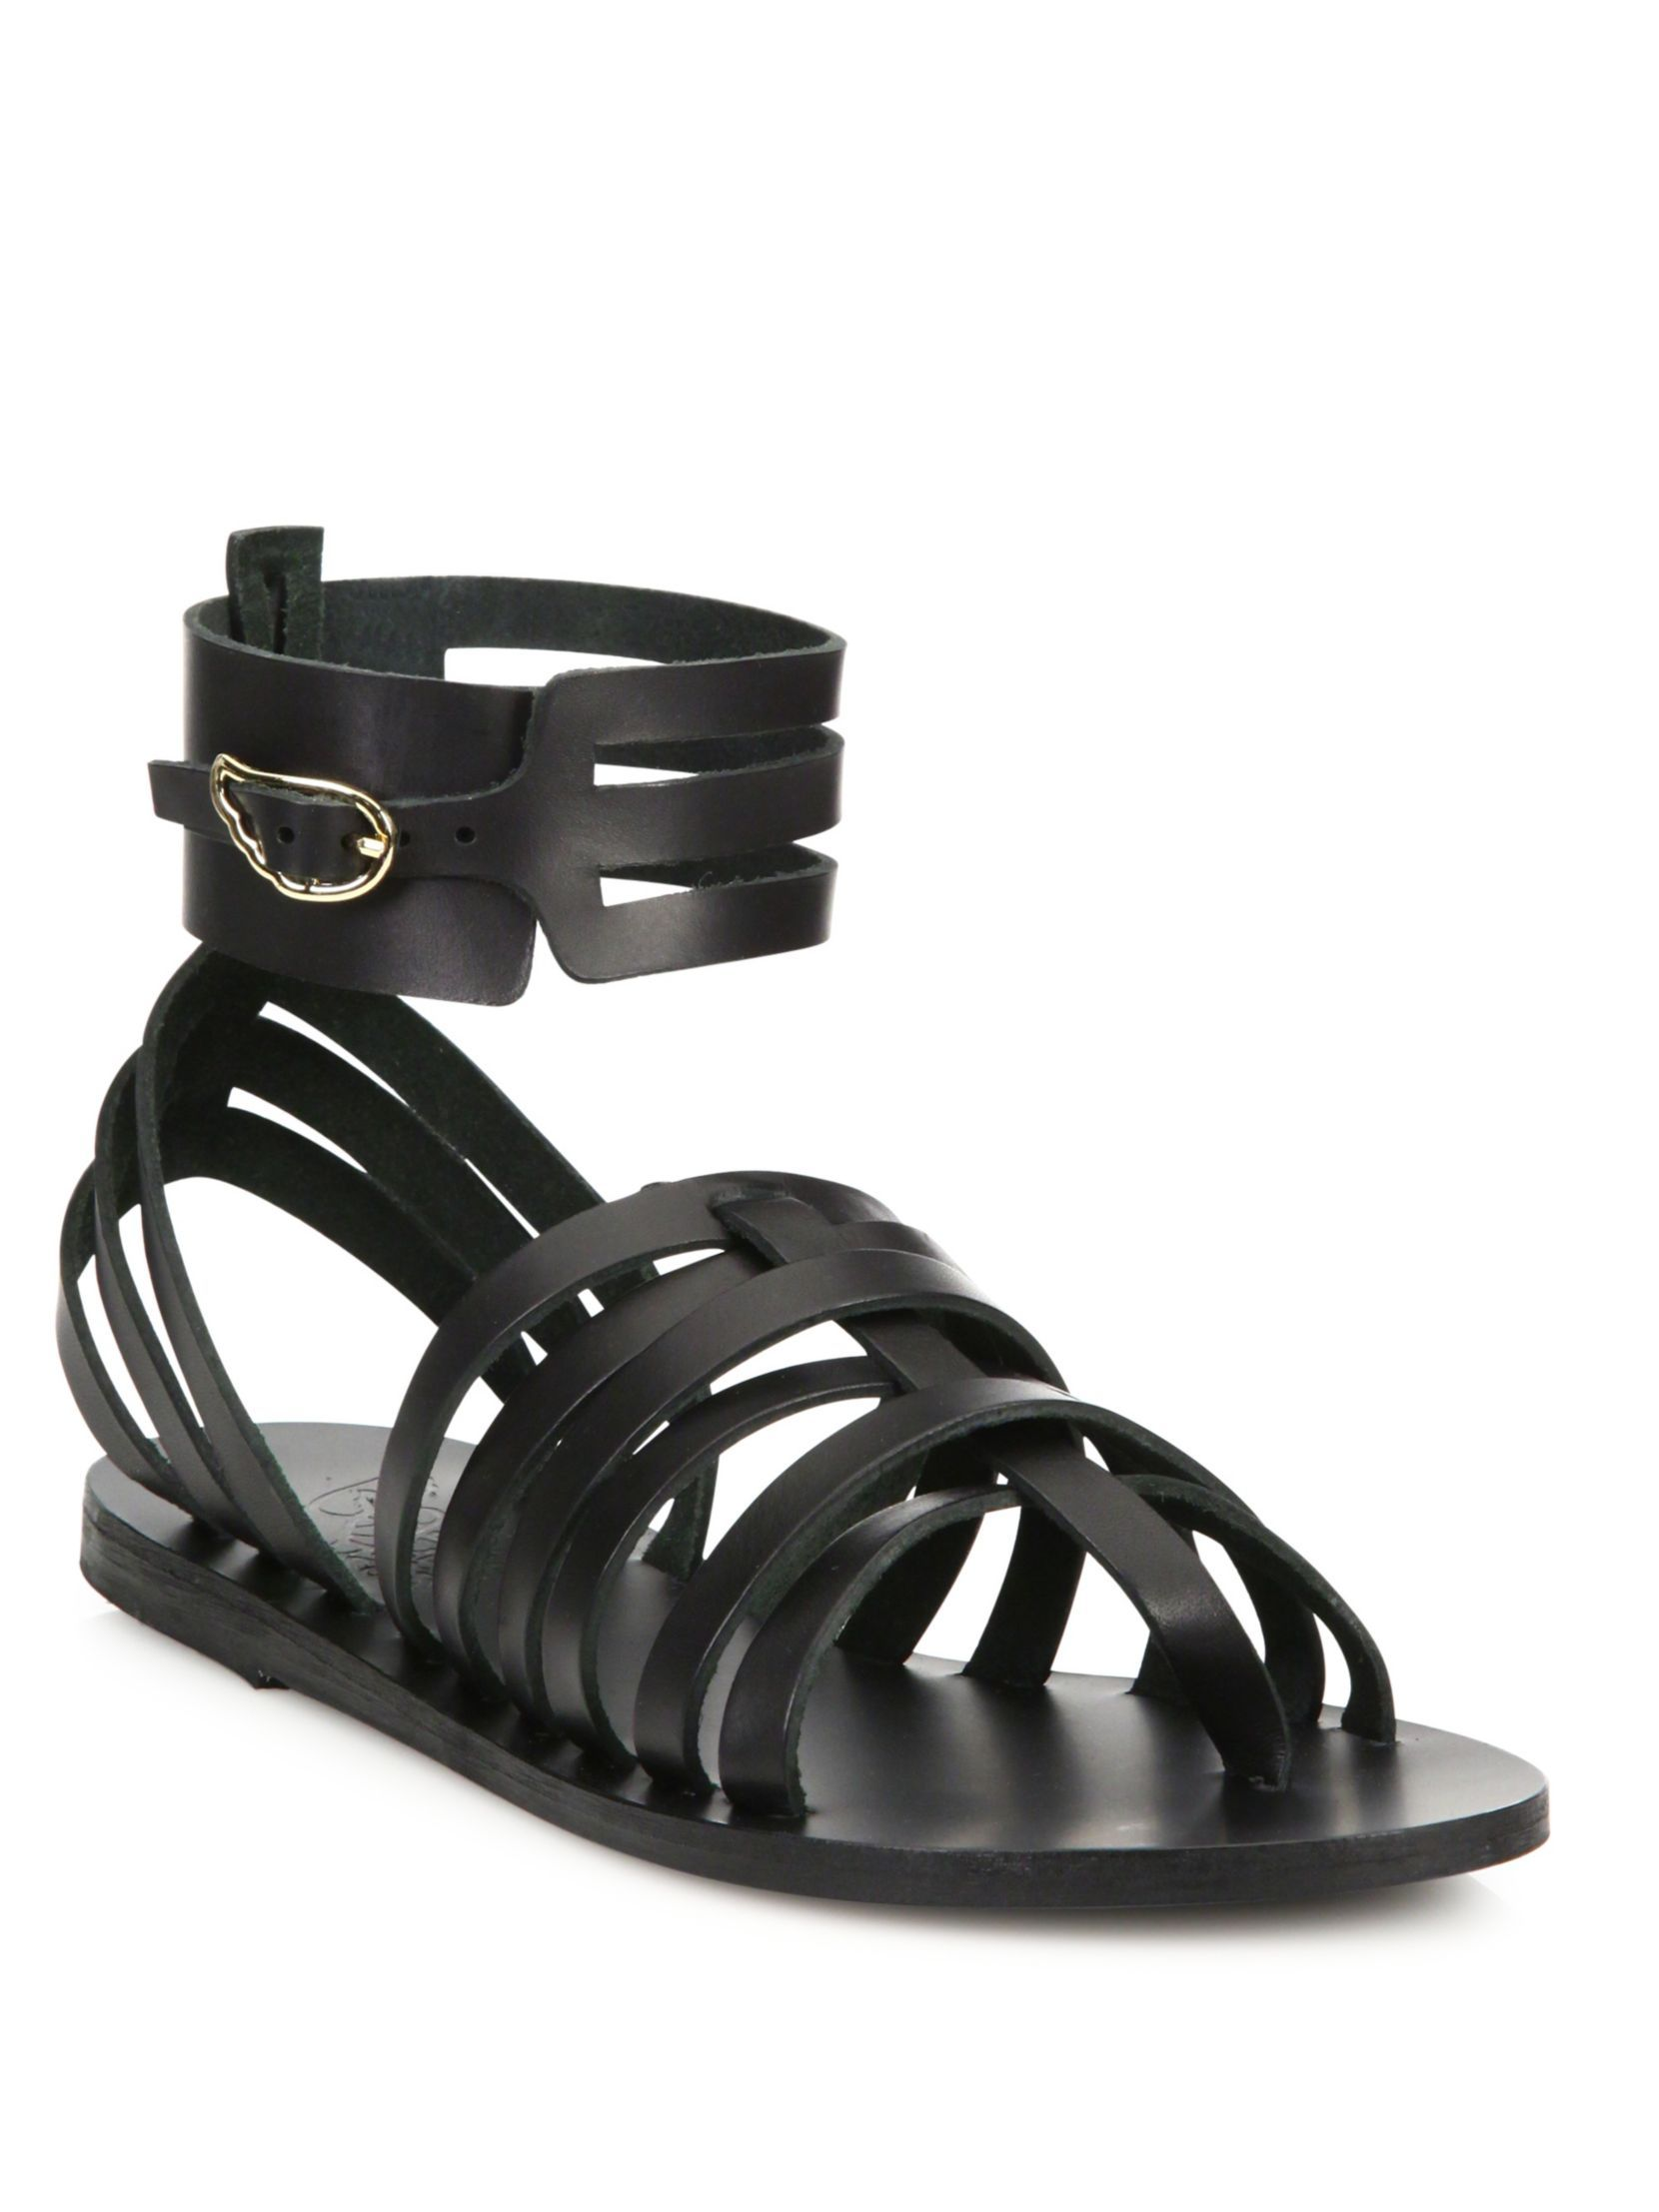 1f4e83424b7 Ancient Greek Sandals Zaira Leather Gladiator Sandals